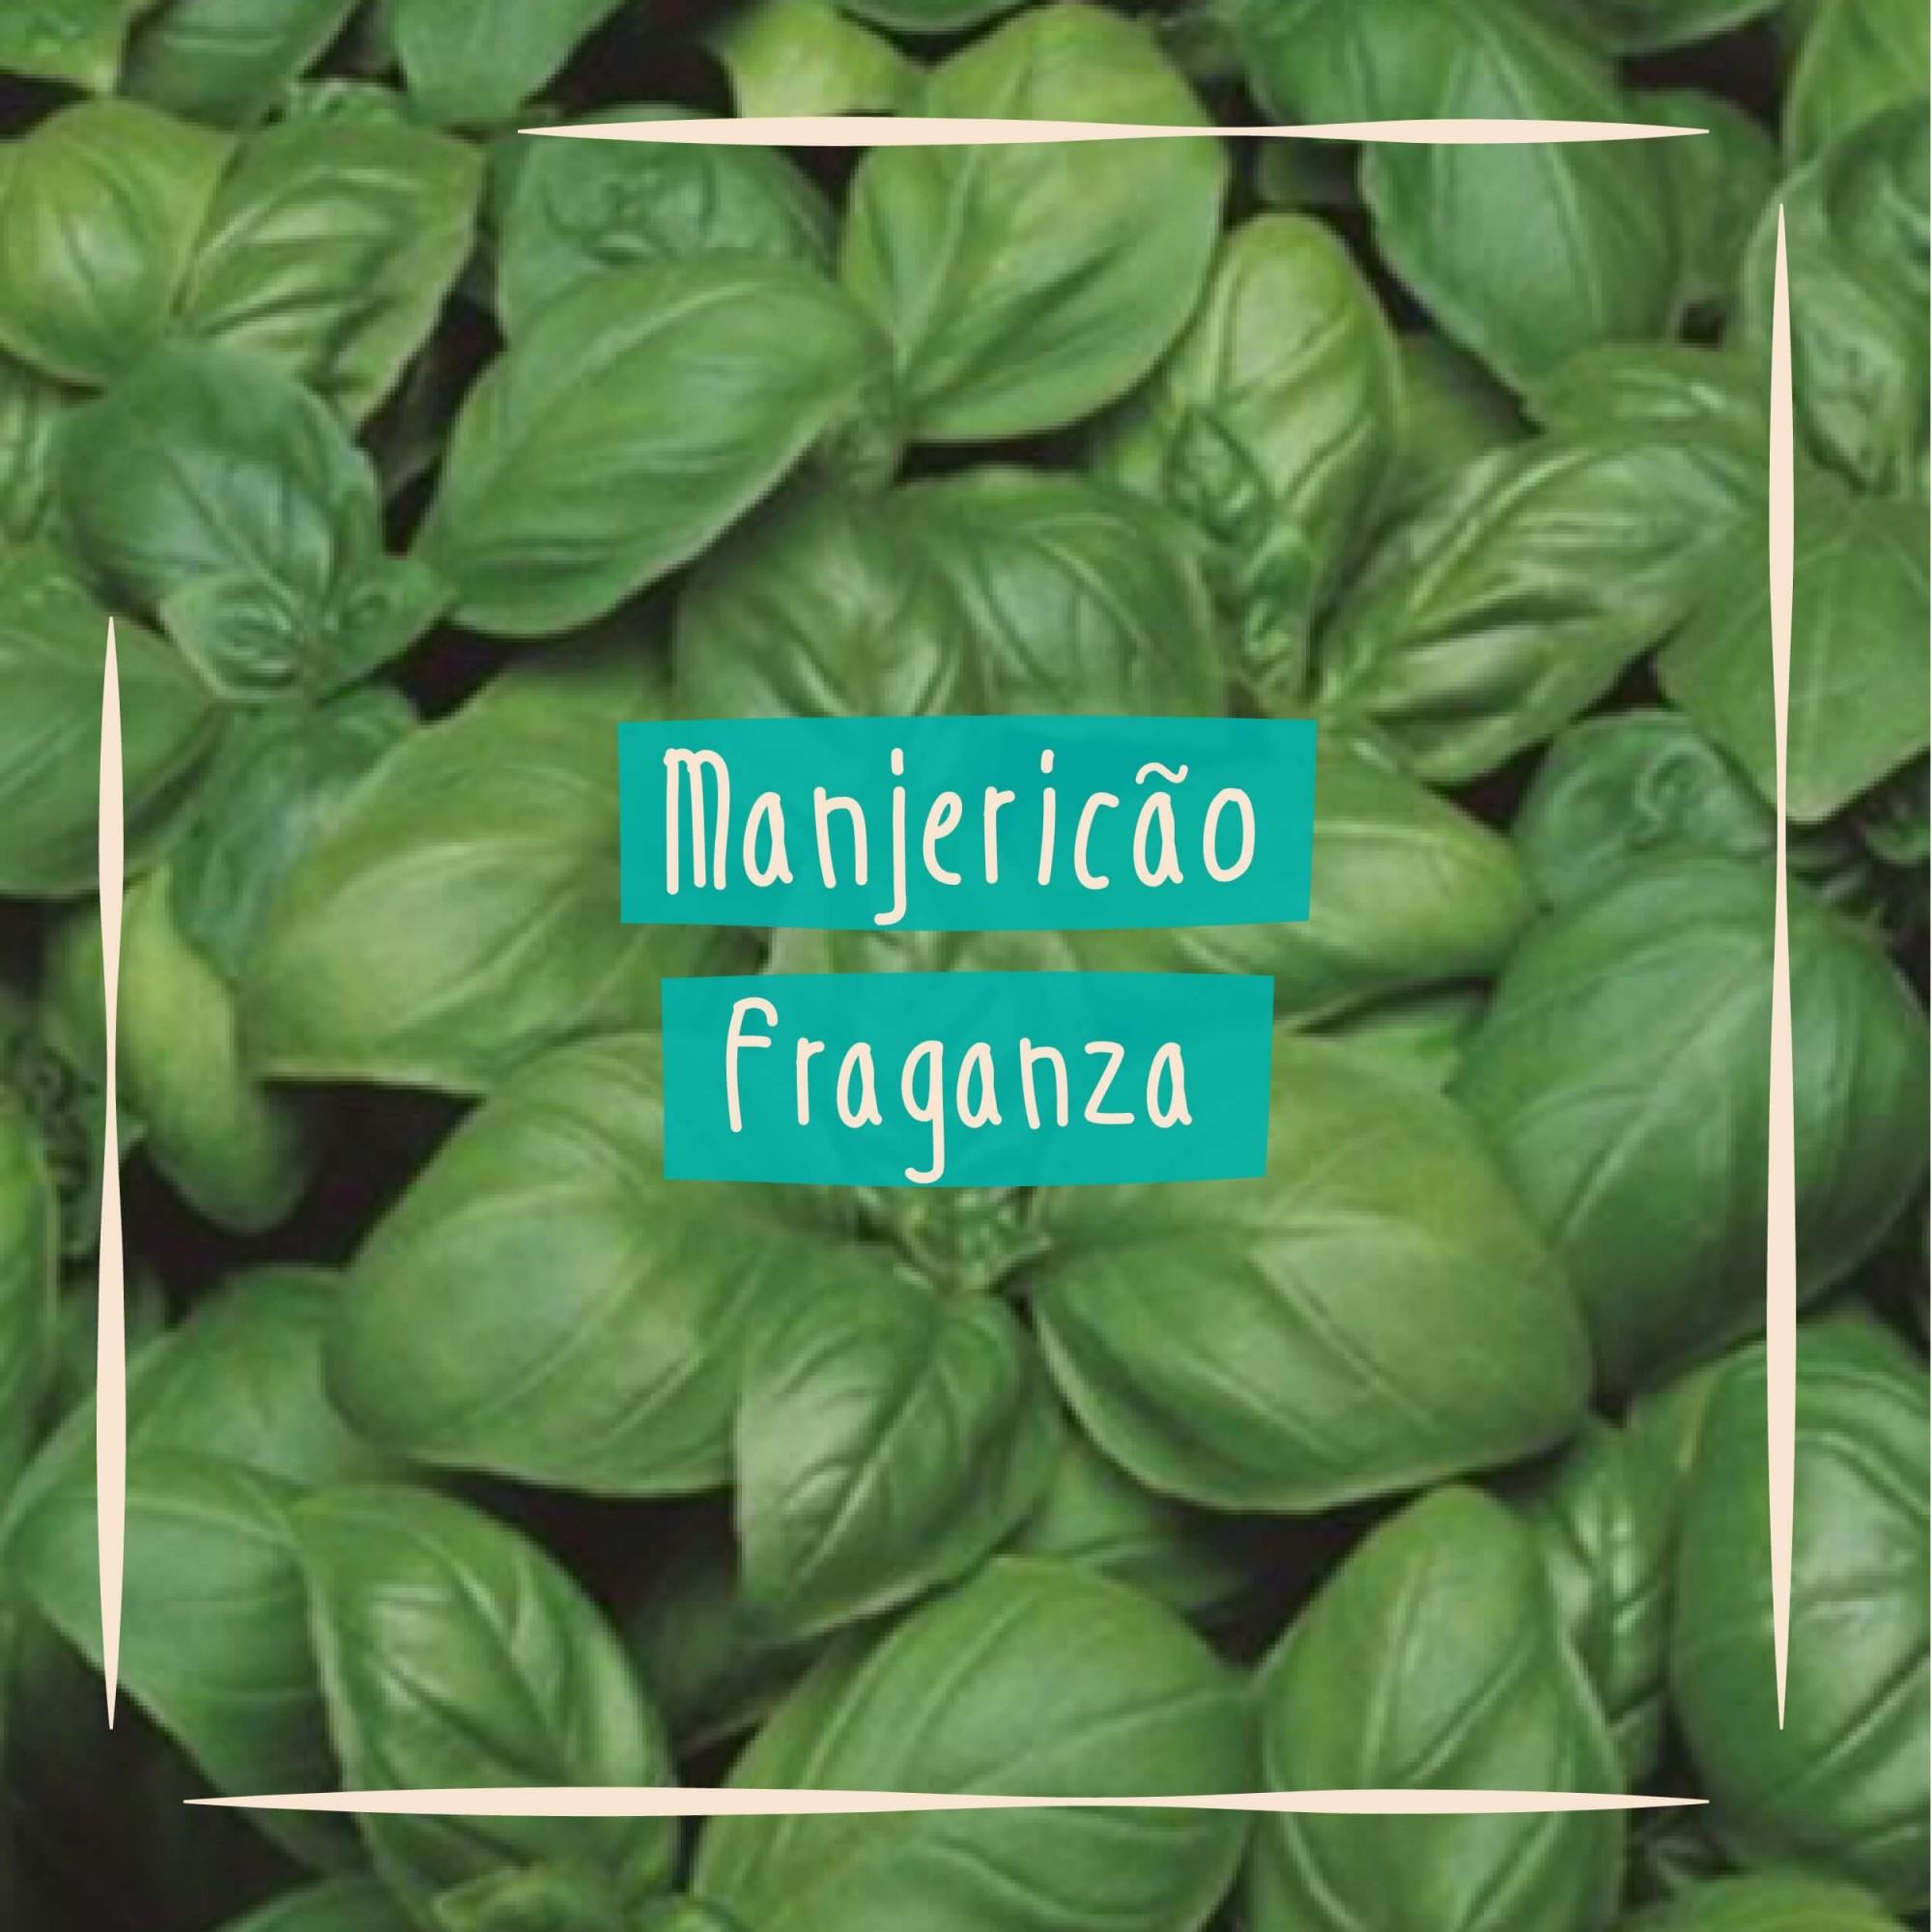 Sementes para plantar Manjericão Basílico Folha Larga em vasos autoirrigáveis RAIZ  - Vasos Raiz Loja Oficial